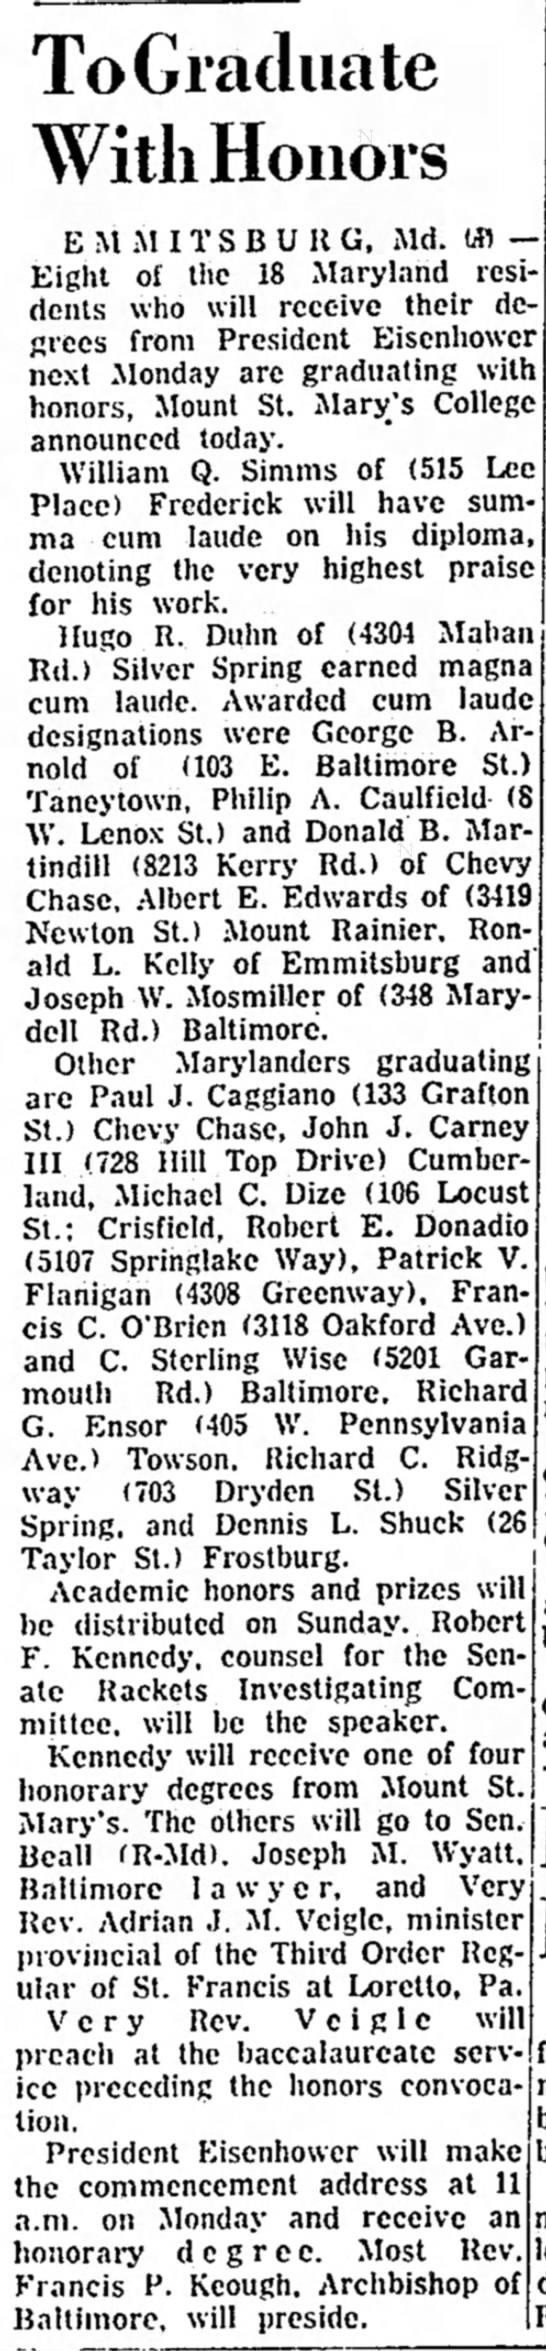 May 26, 1958The NewsFrederick, Maryland -